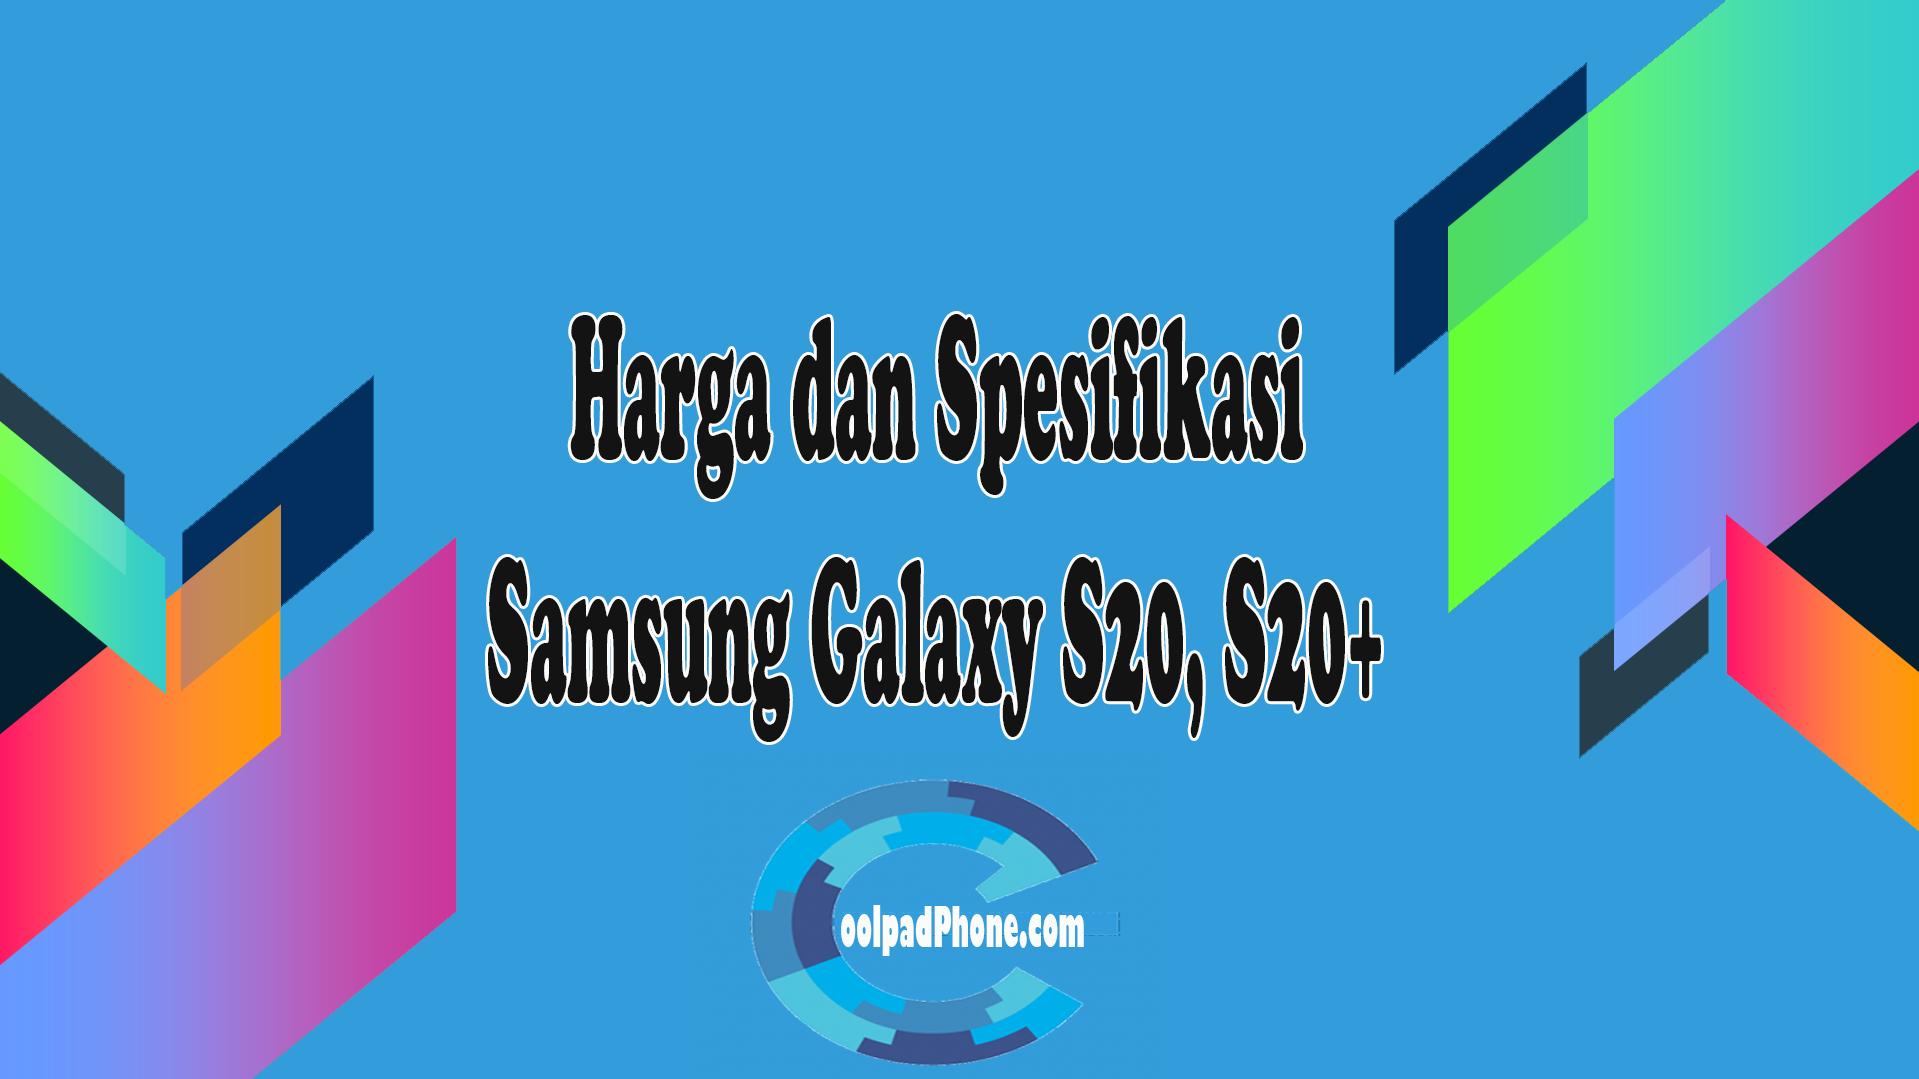 Harga dan Spesifikasi samsung galaxy s20, s20+